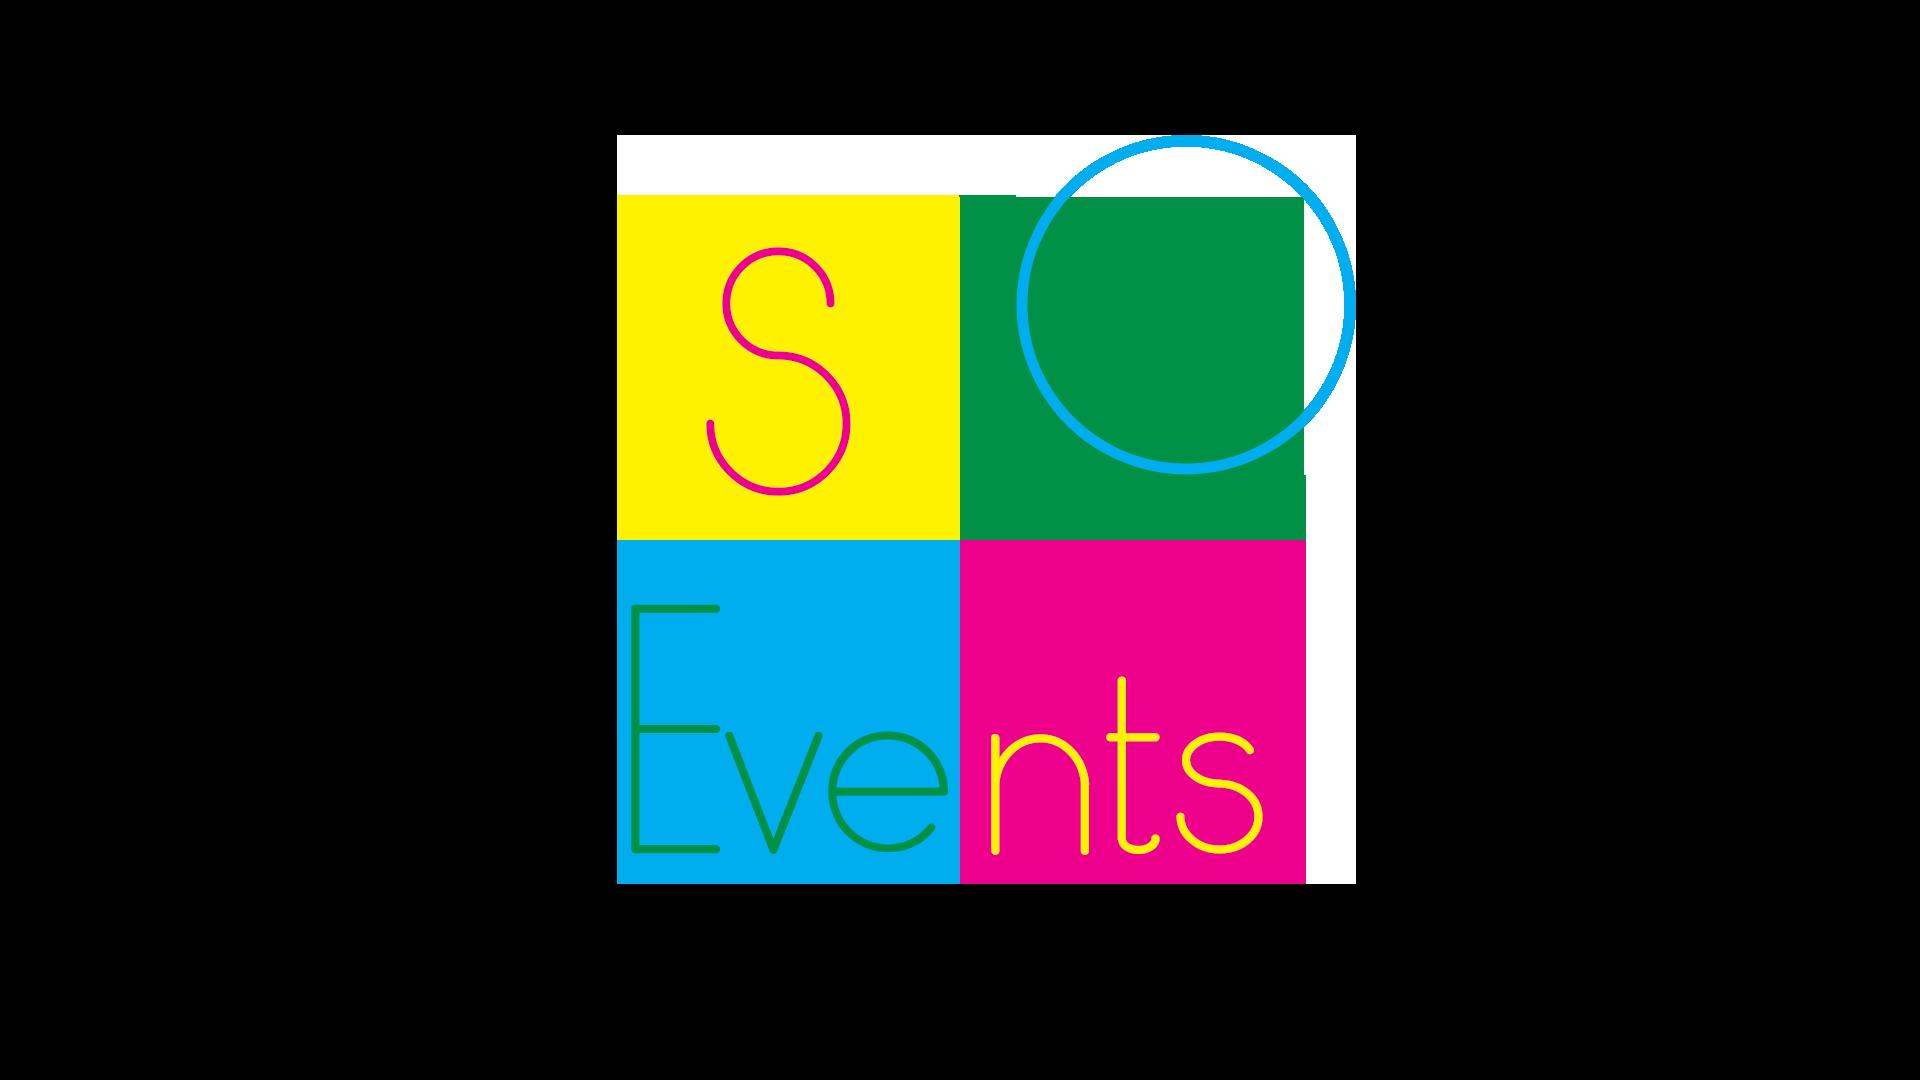 Logo So events